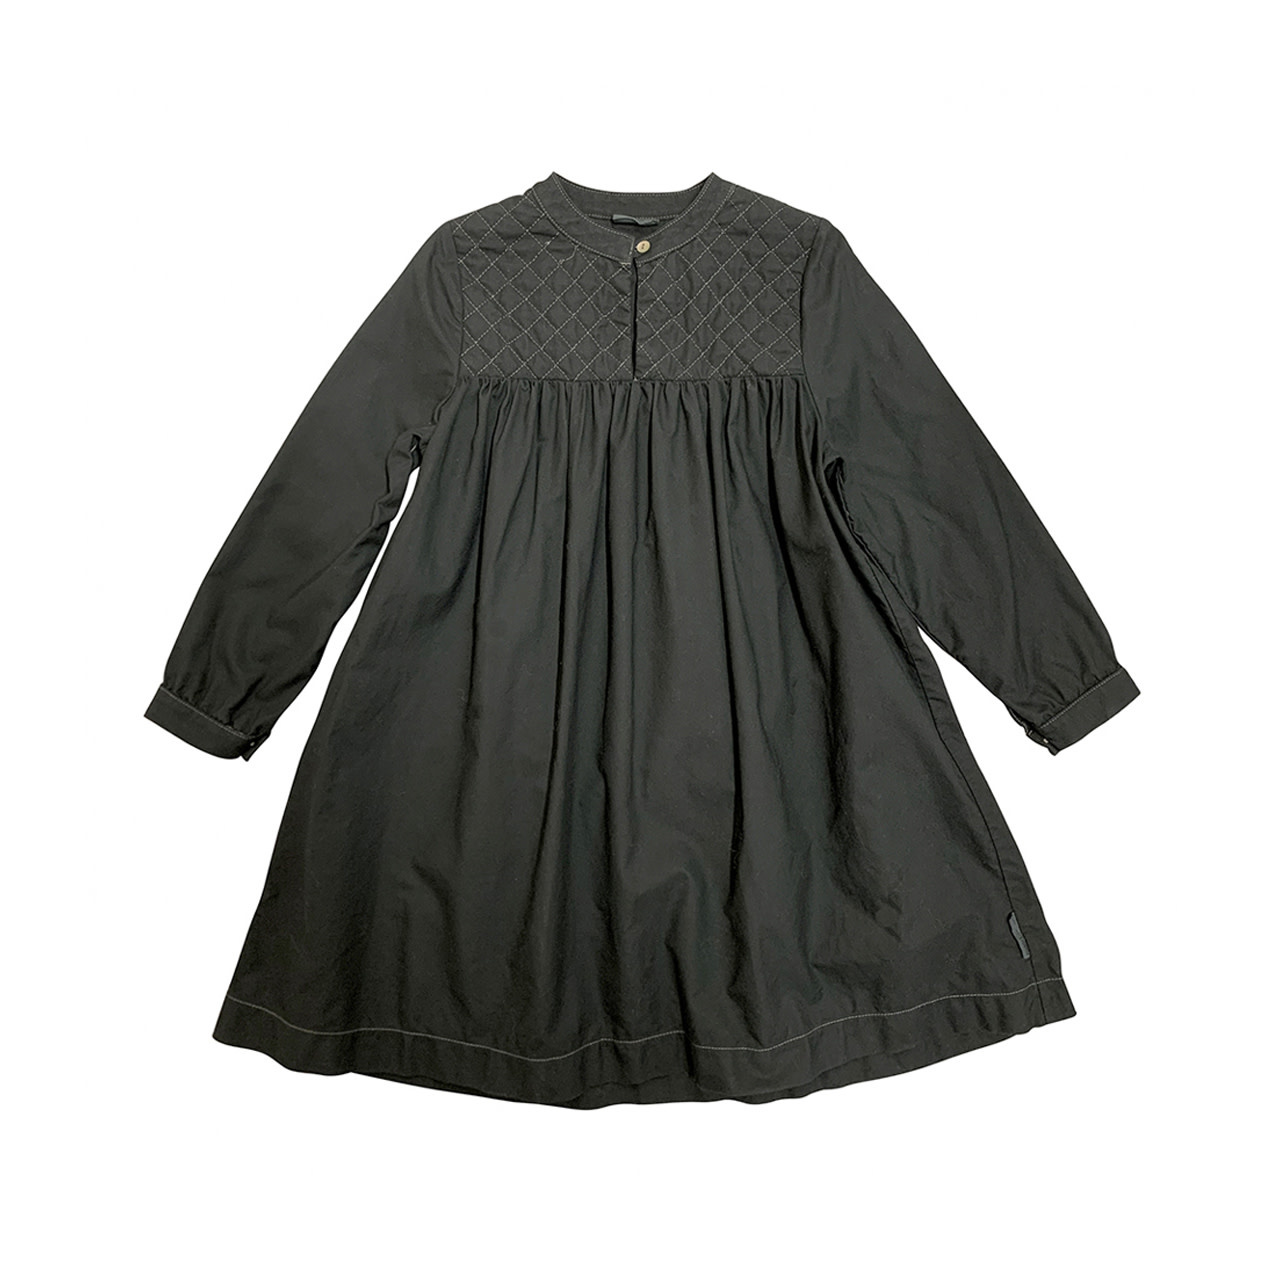 Maed For mini Maed for mini - Dress loving lizzard